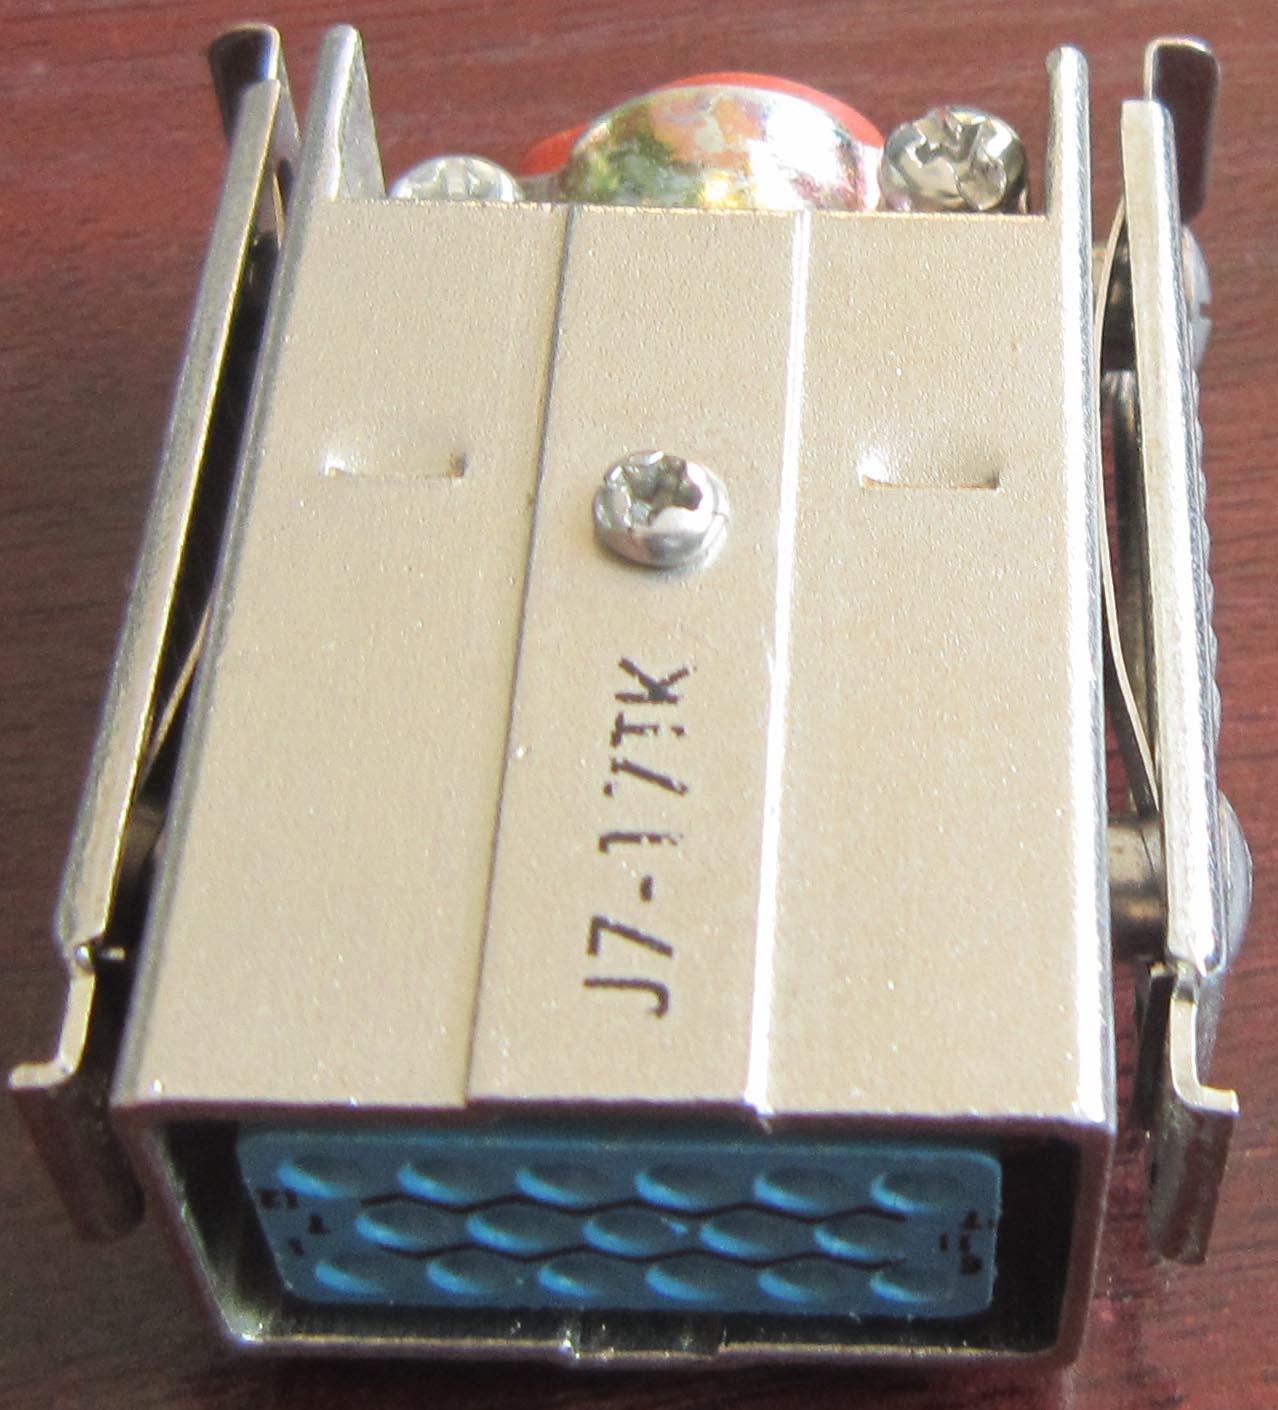 J7 series for military applicationrectangular connectors 7